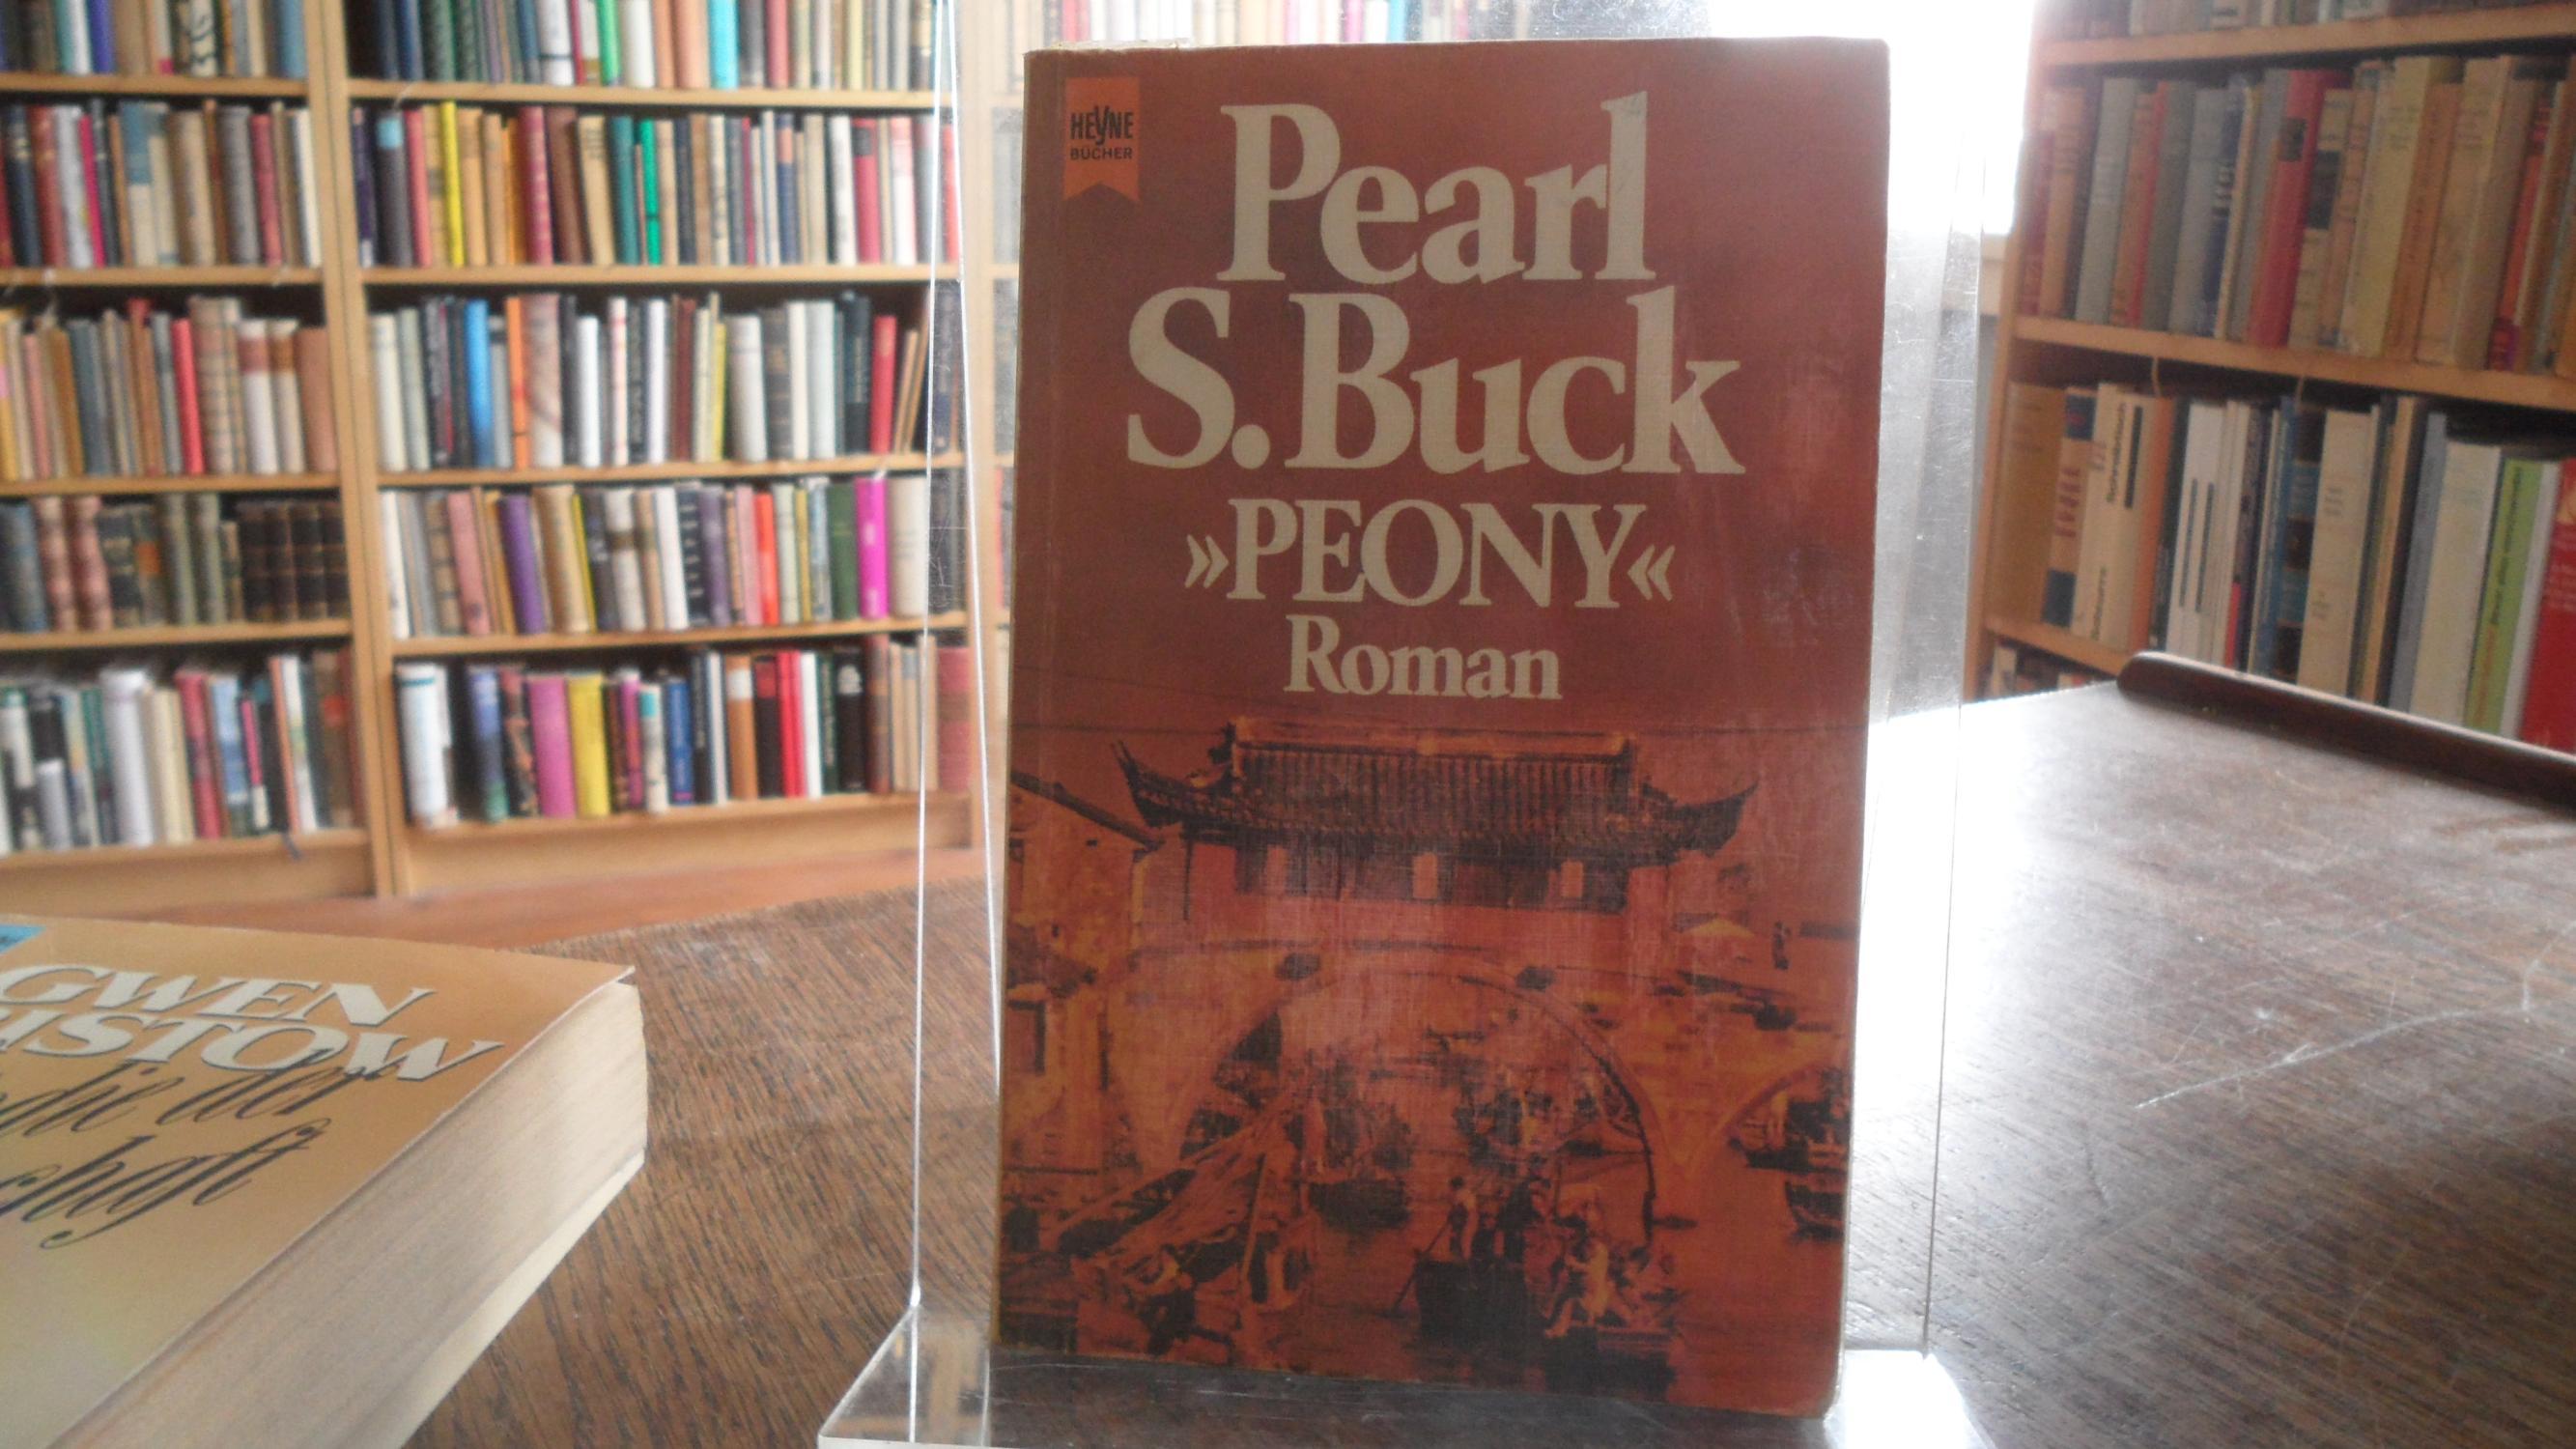 Peony. Roman.: Buck, Pearl S.: